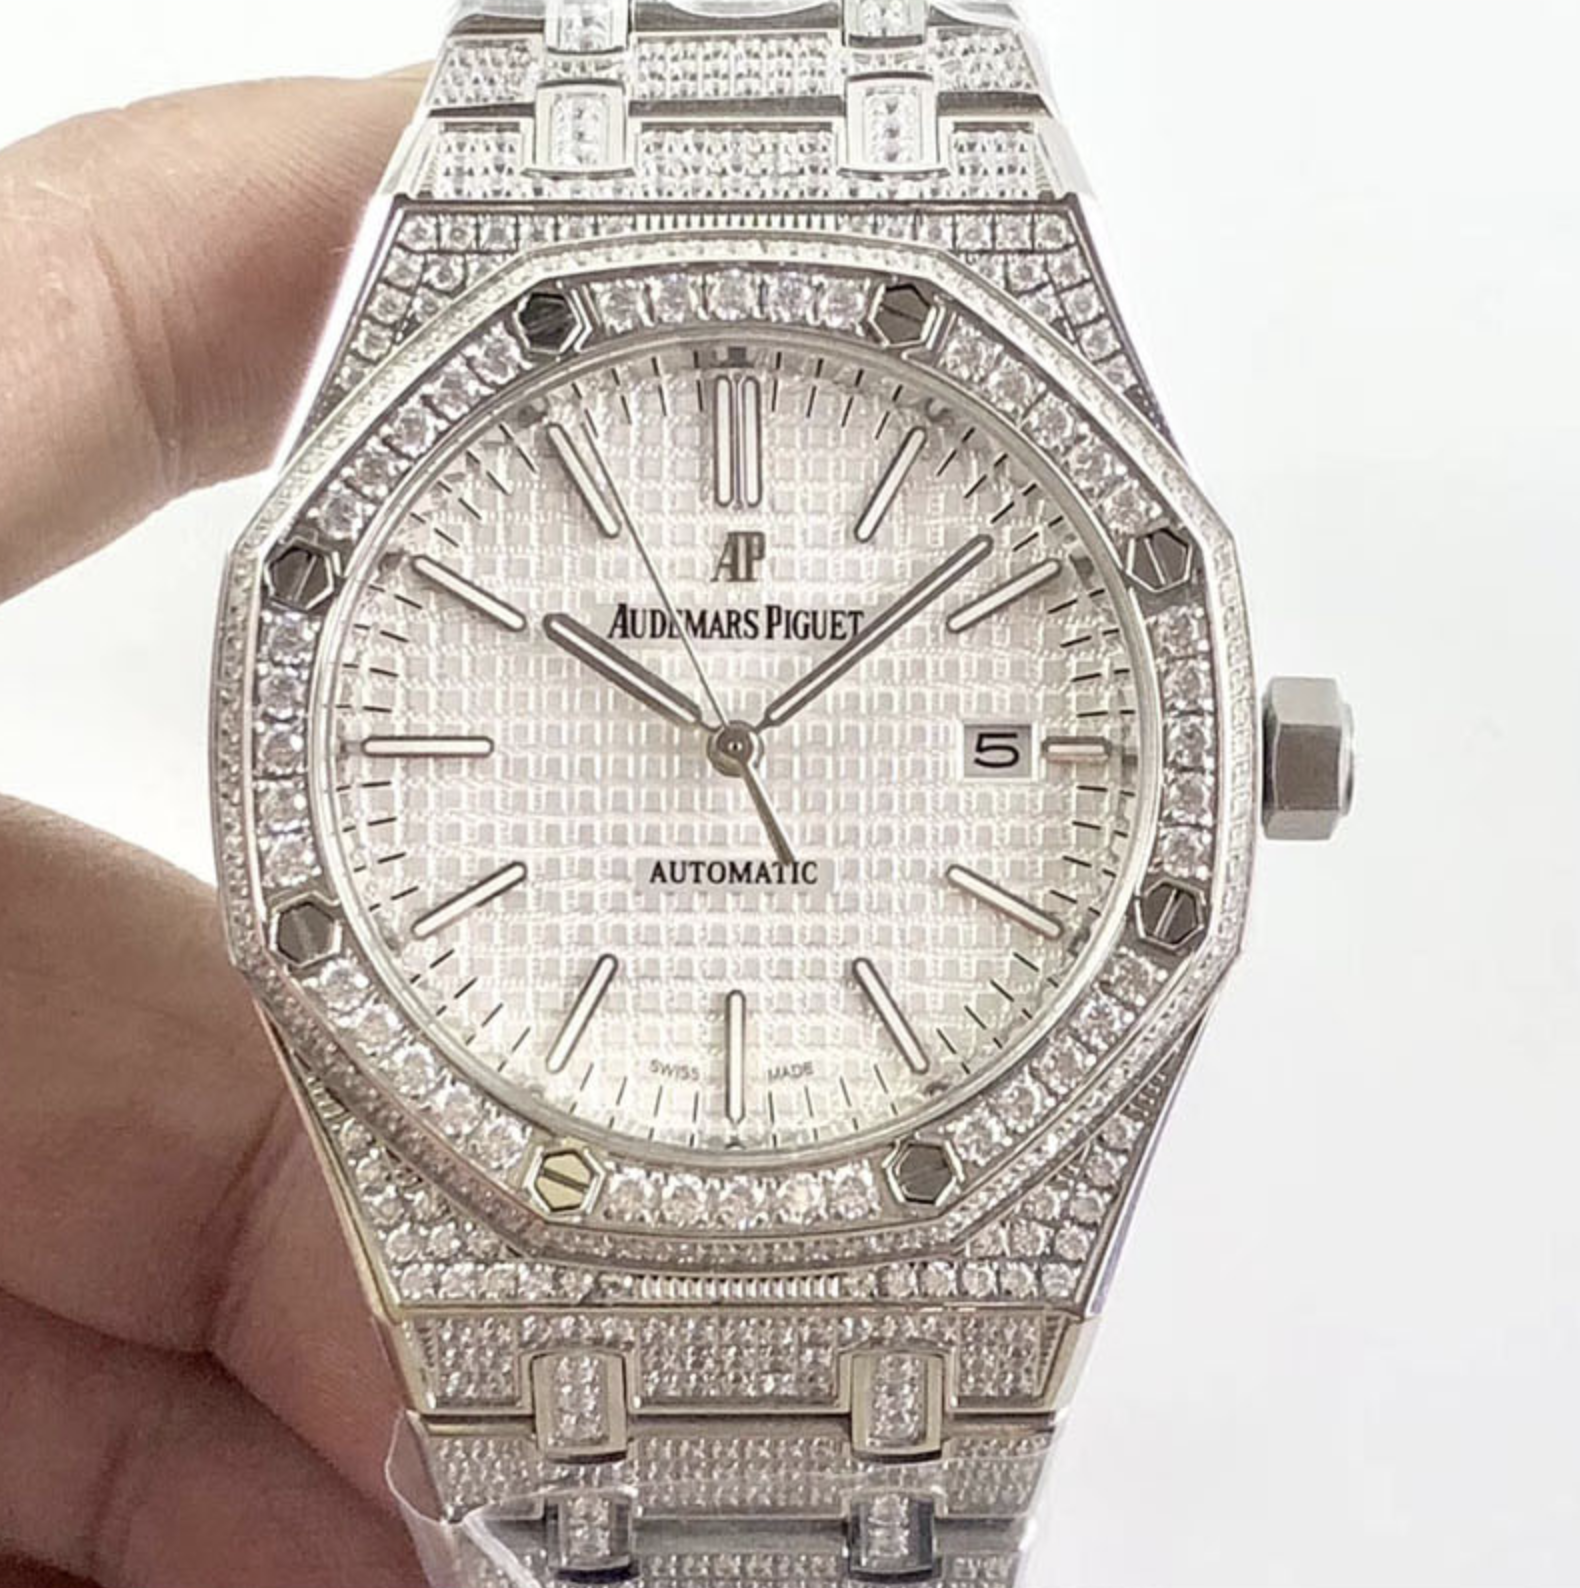 Audemars piguet replica royal oak 15400ST 41mm white gold full paved diamonds white dial